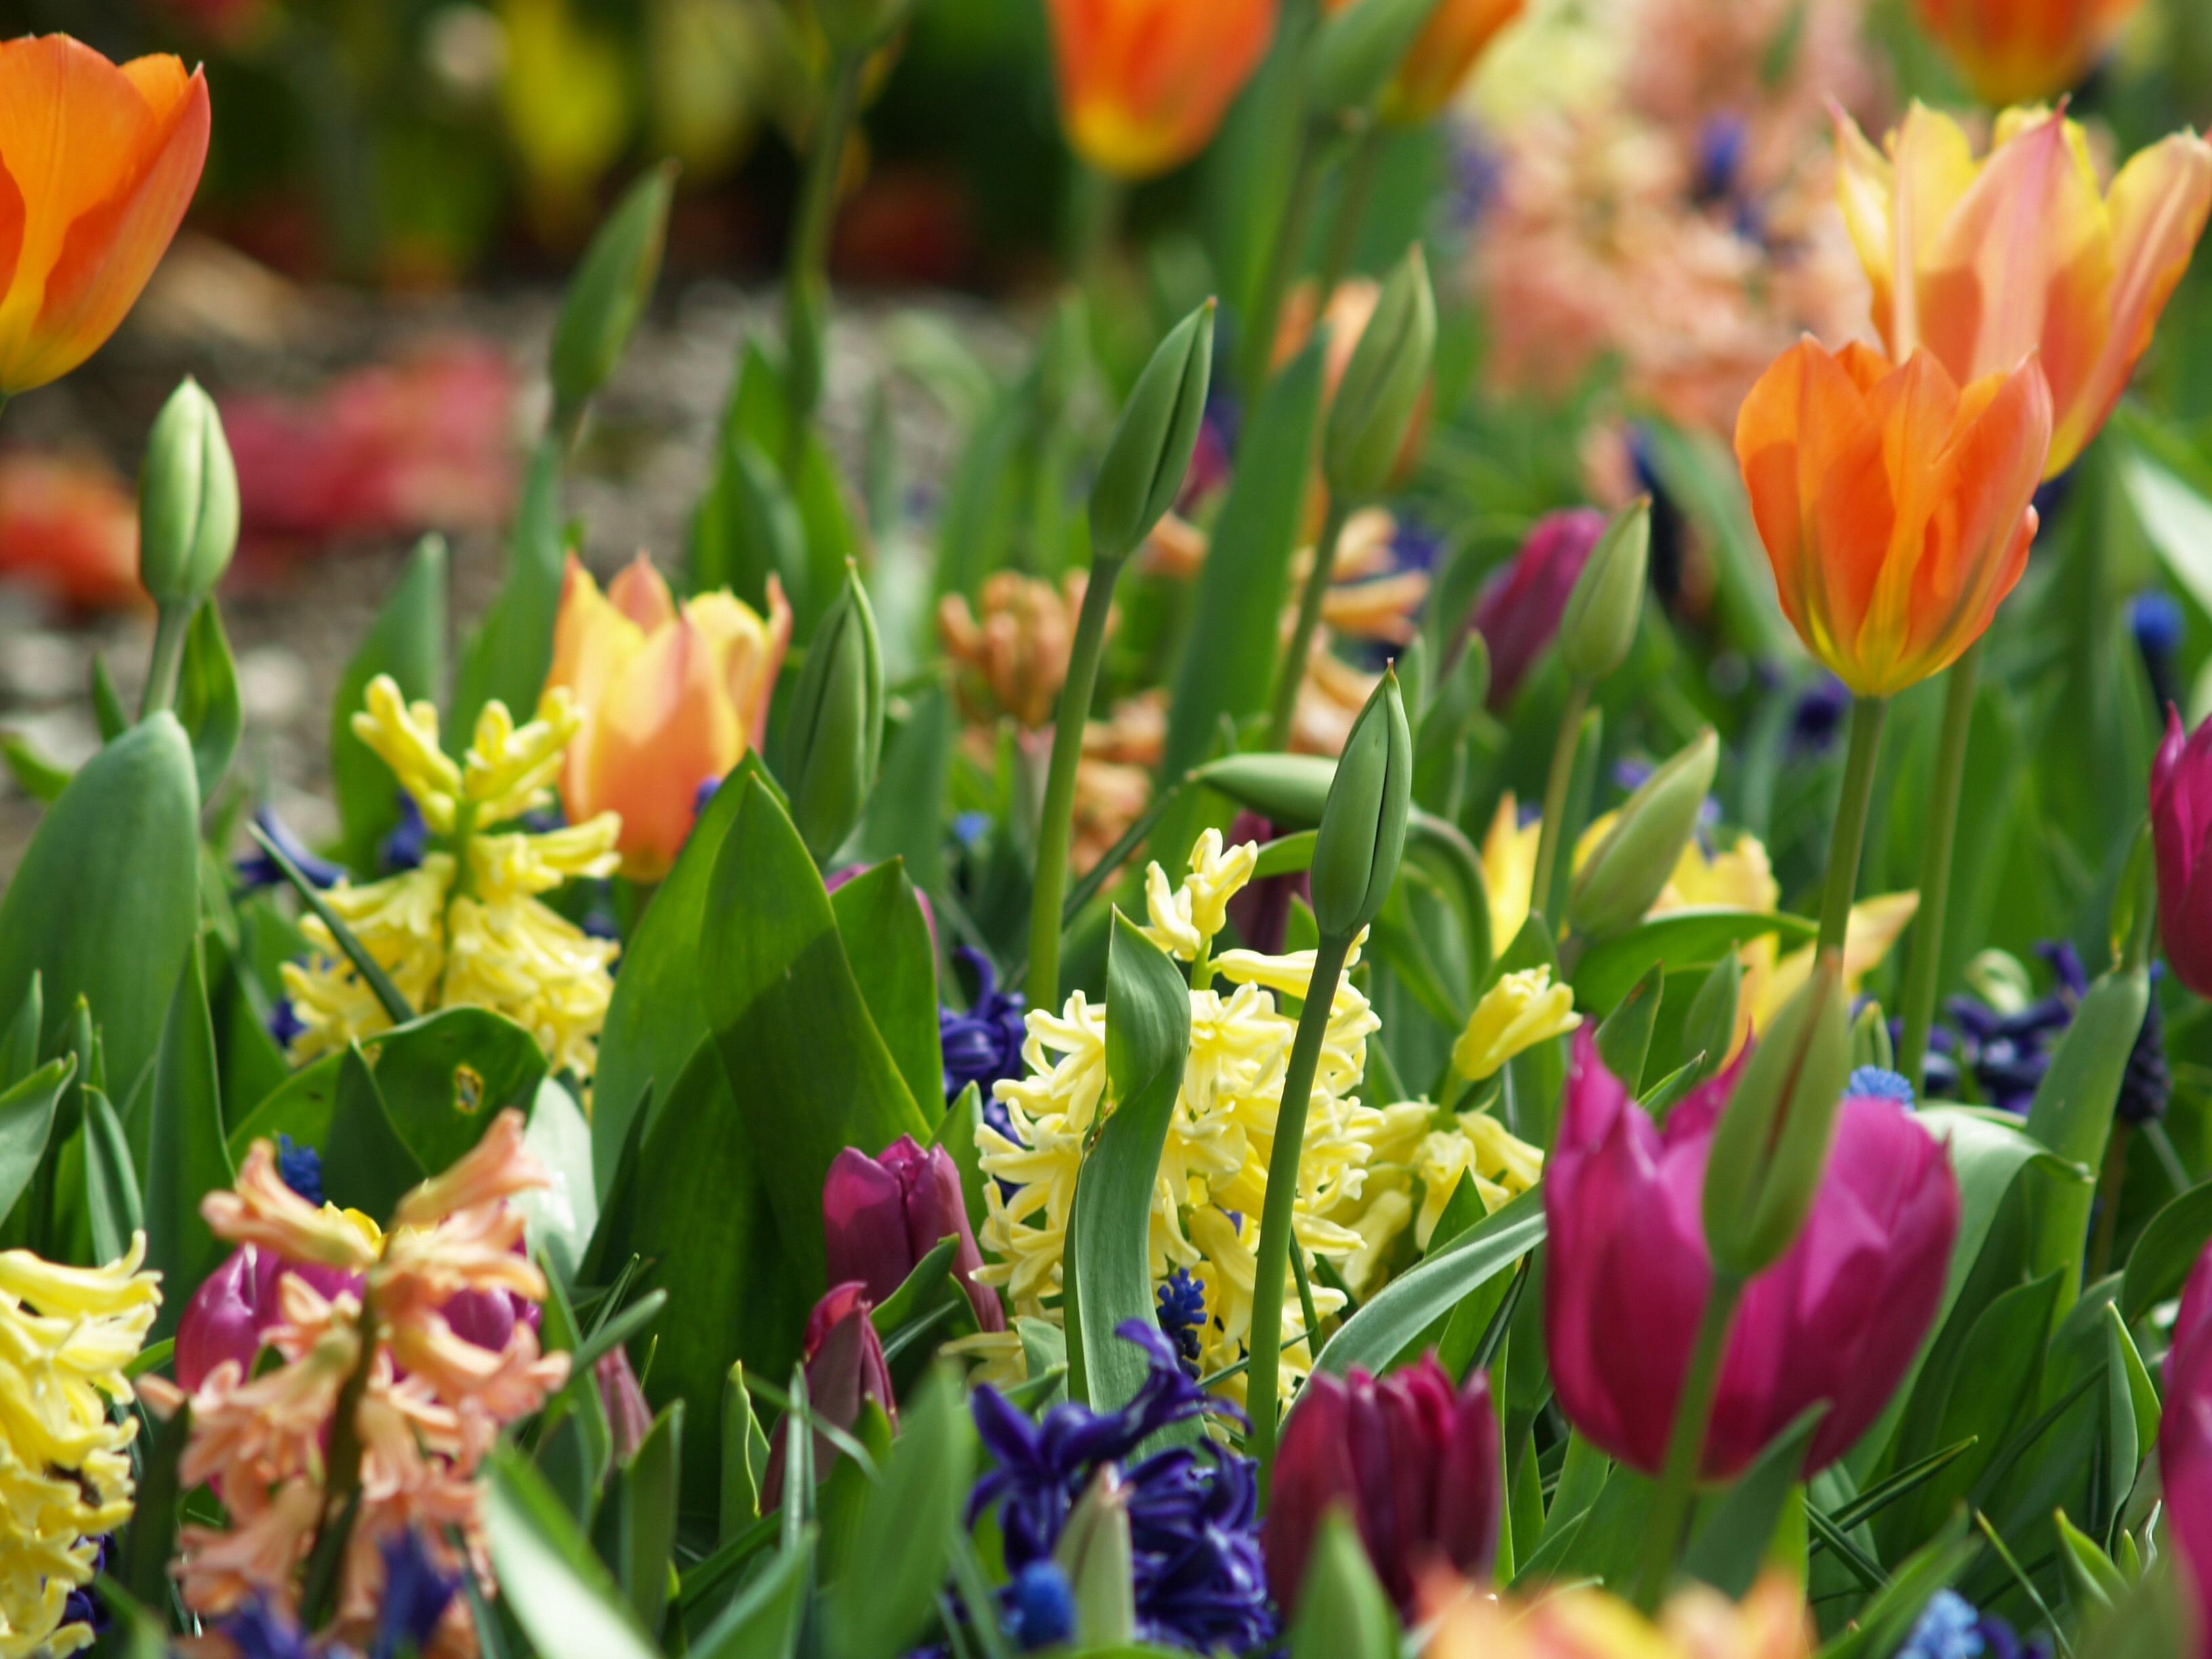 Красивое фото с весенними цветами